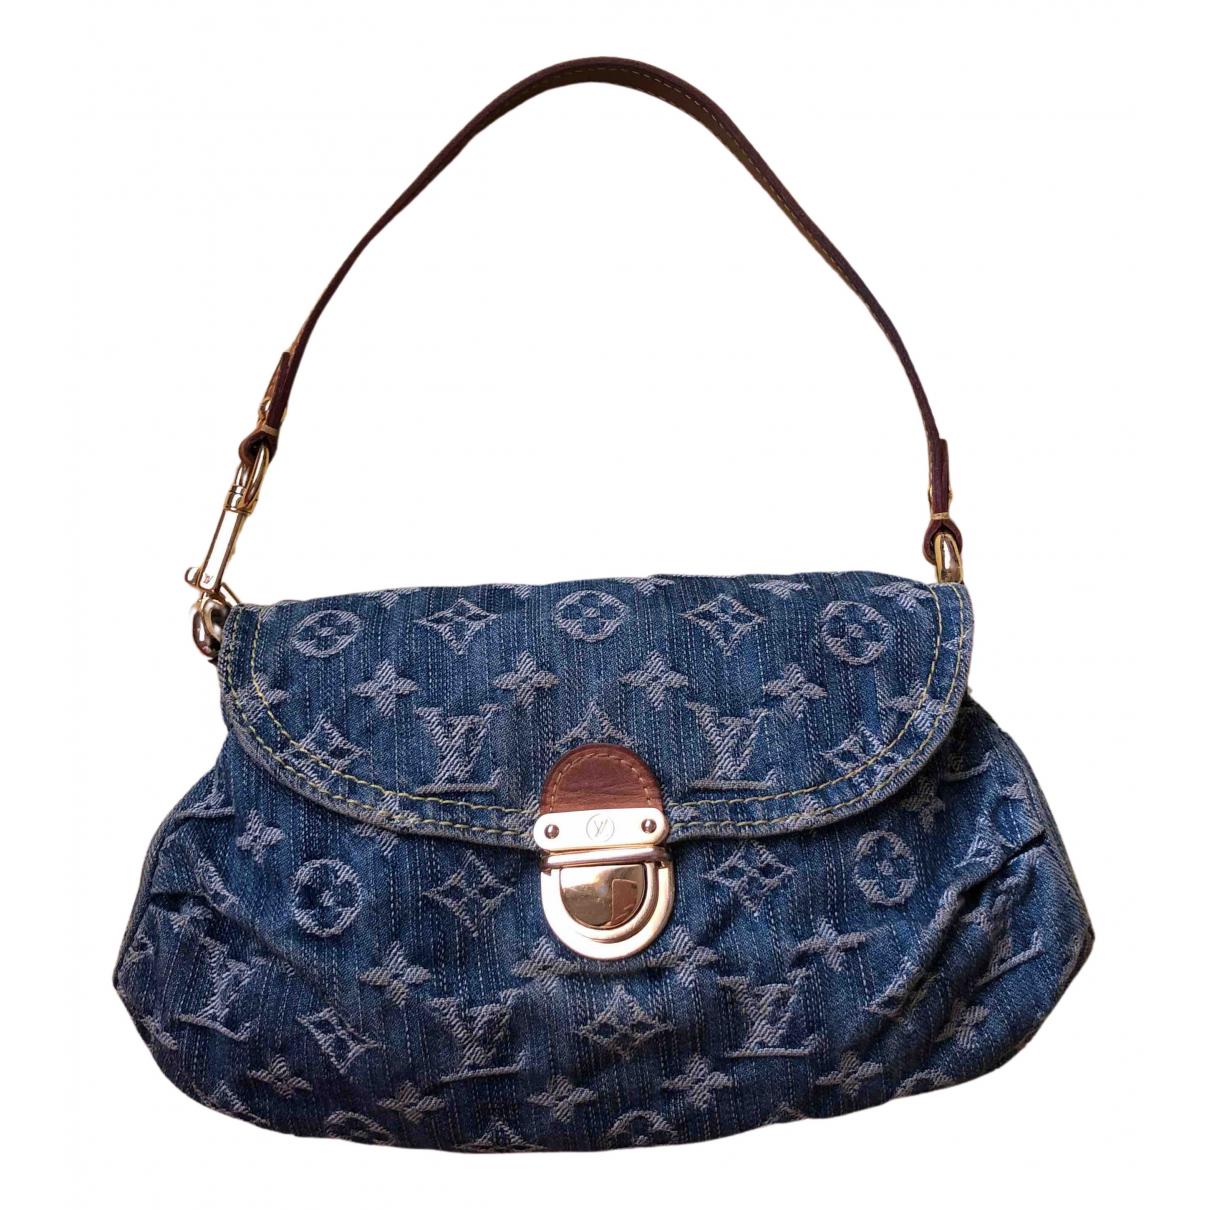 Louis Vuitton - Sac a main Pleaty pour femme en denim - bleu